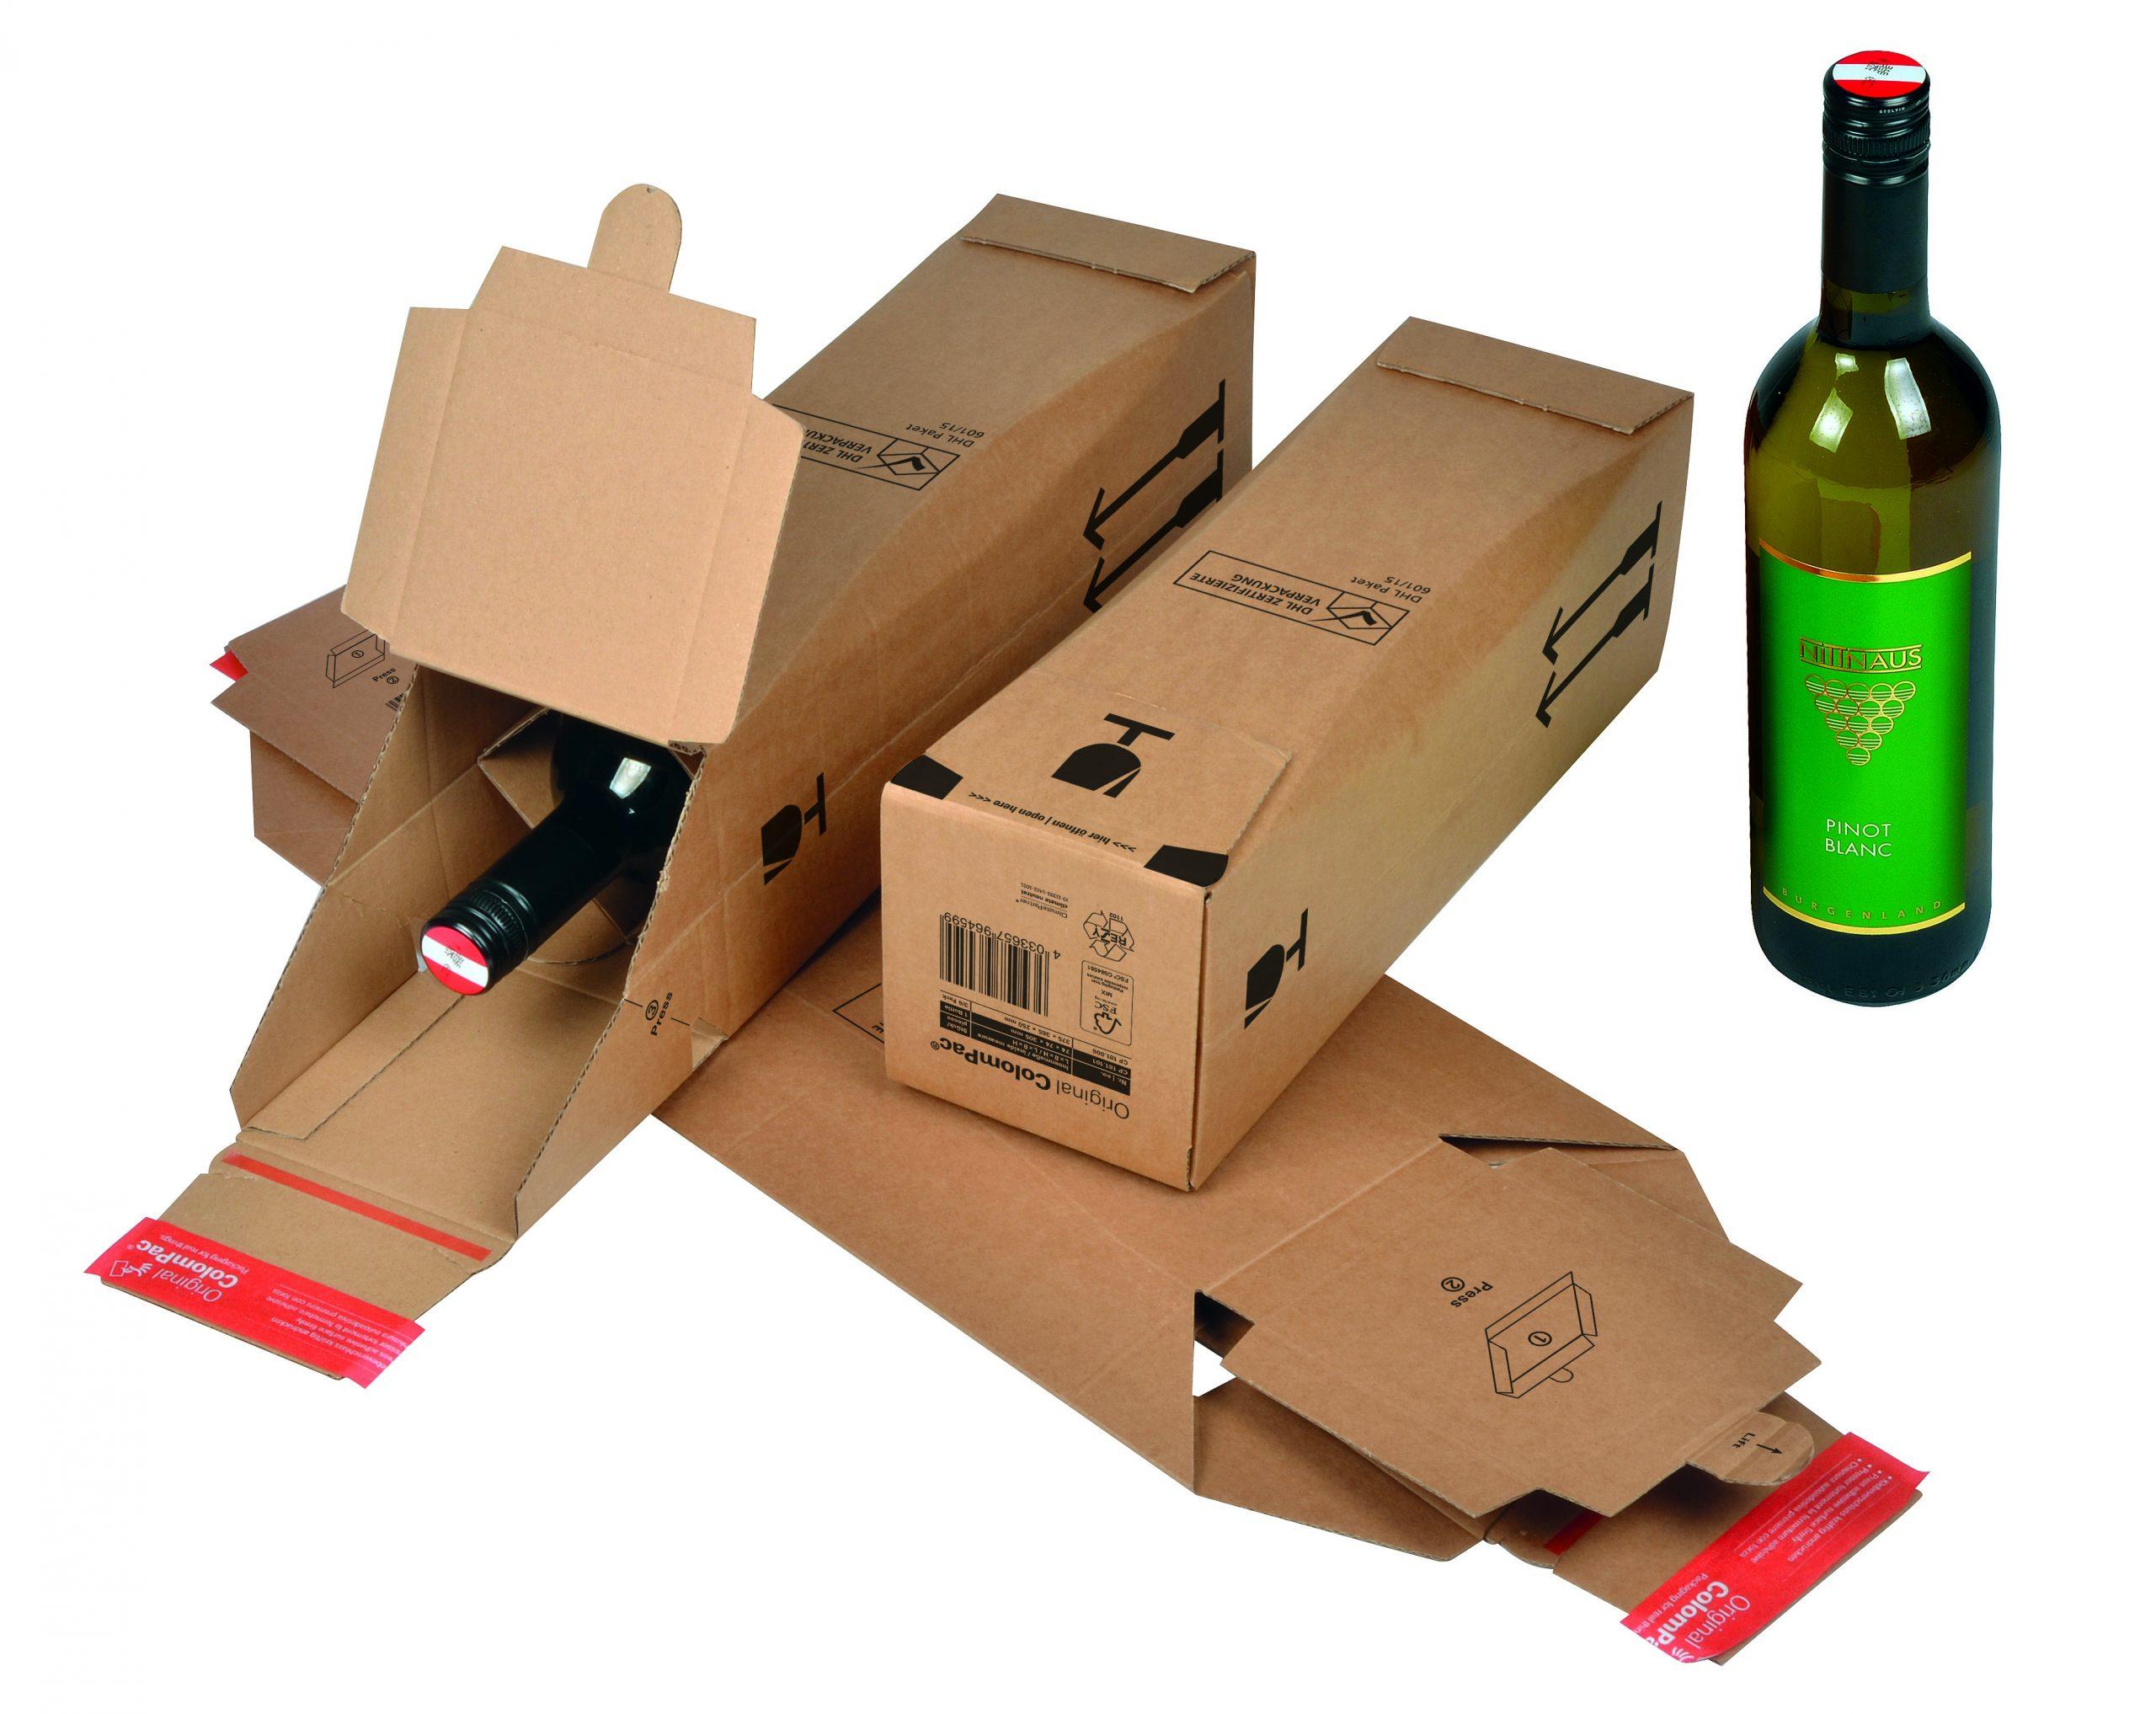 Wijnfles Verzenddoos kado doos CP 181.101